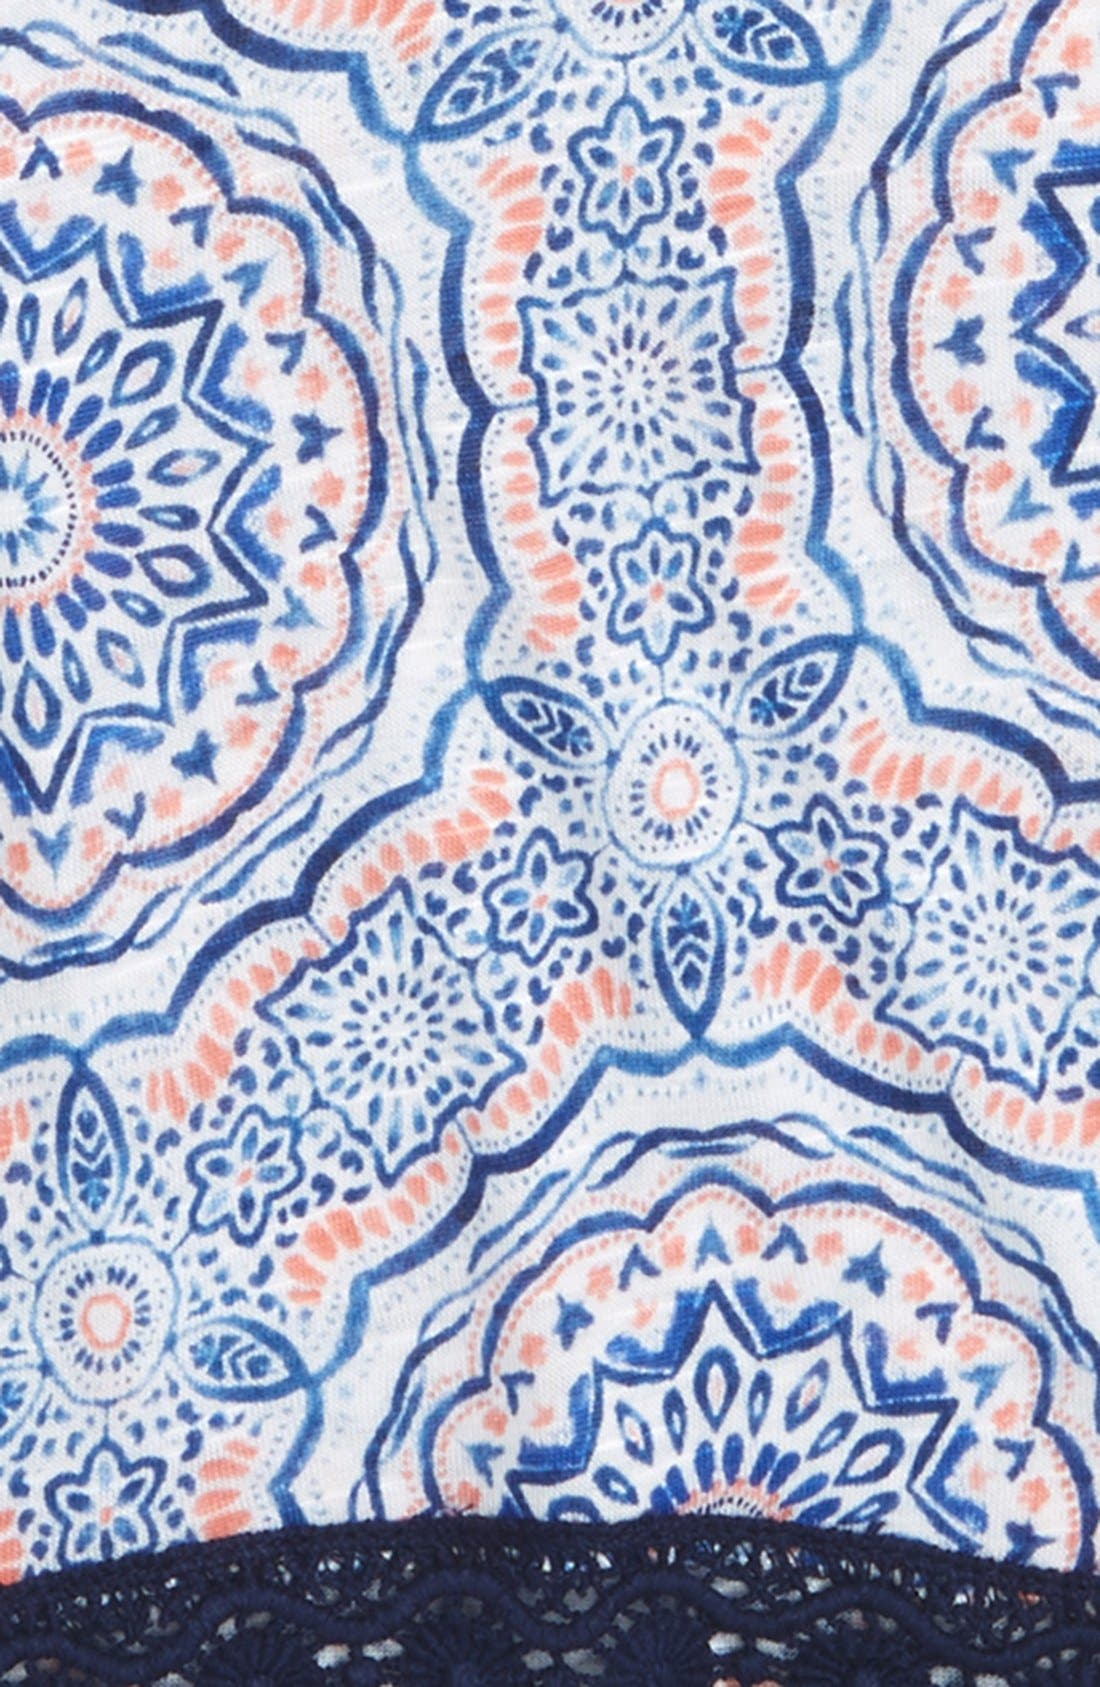 Alternate Image 2  - Freshman Print Crochet Trim Tee (Big Girls)